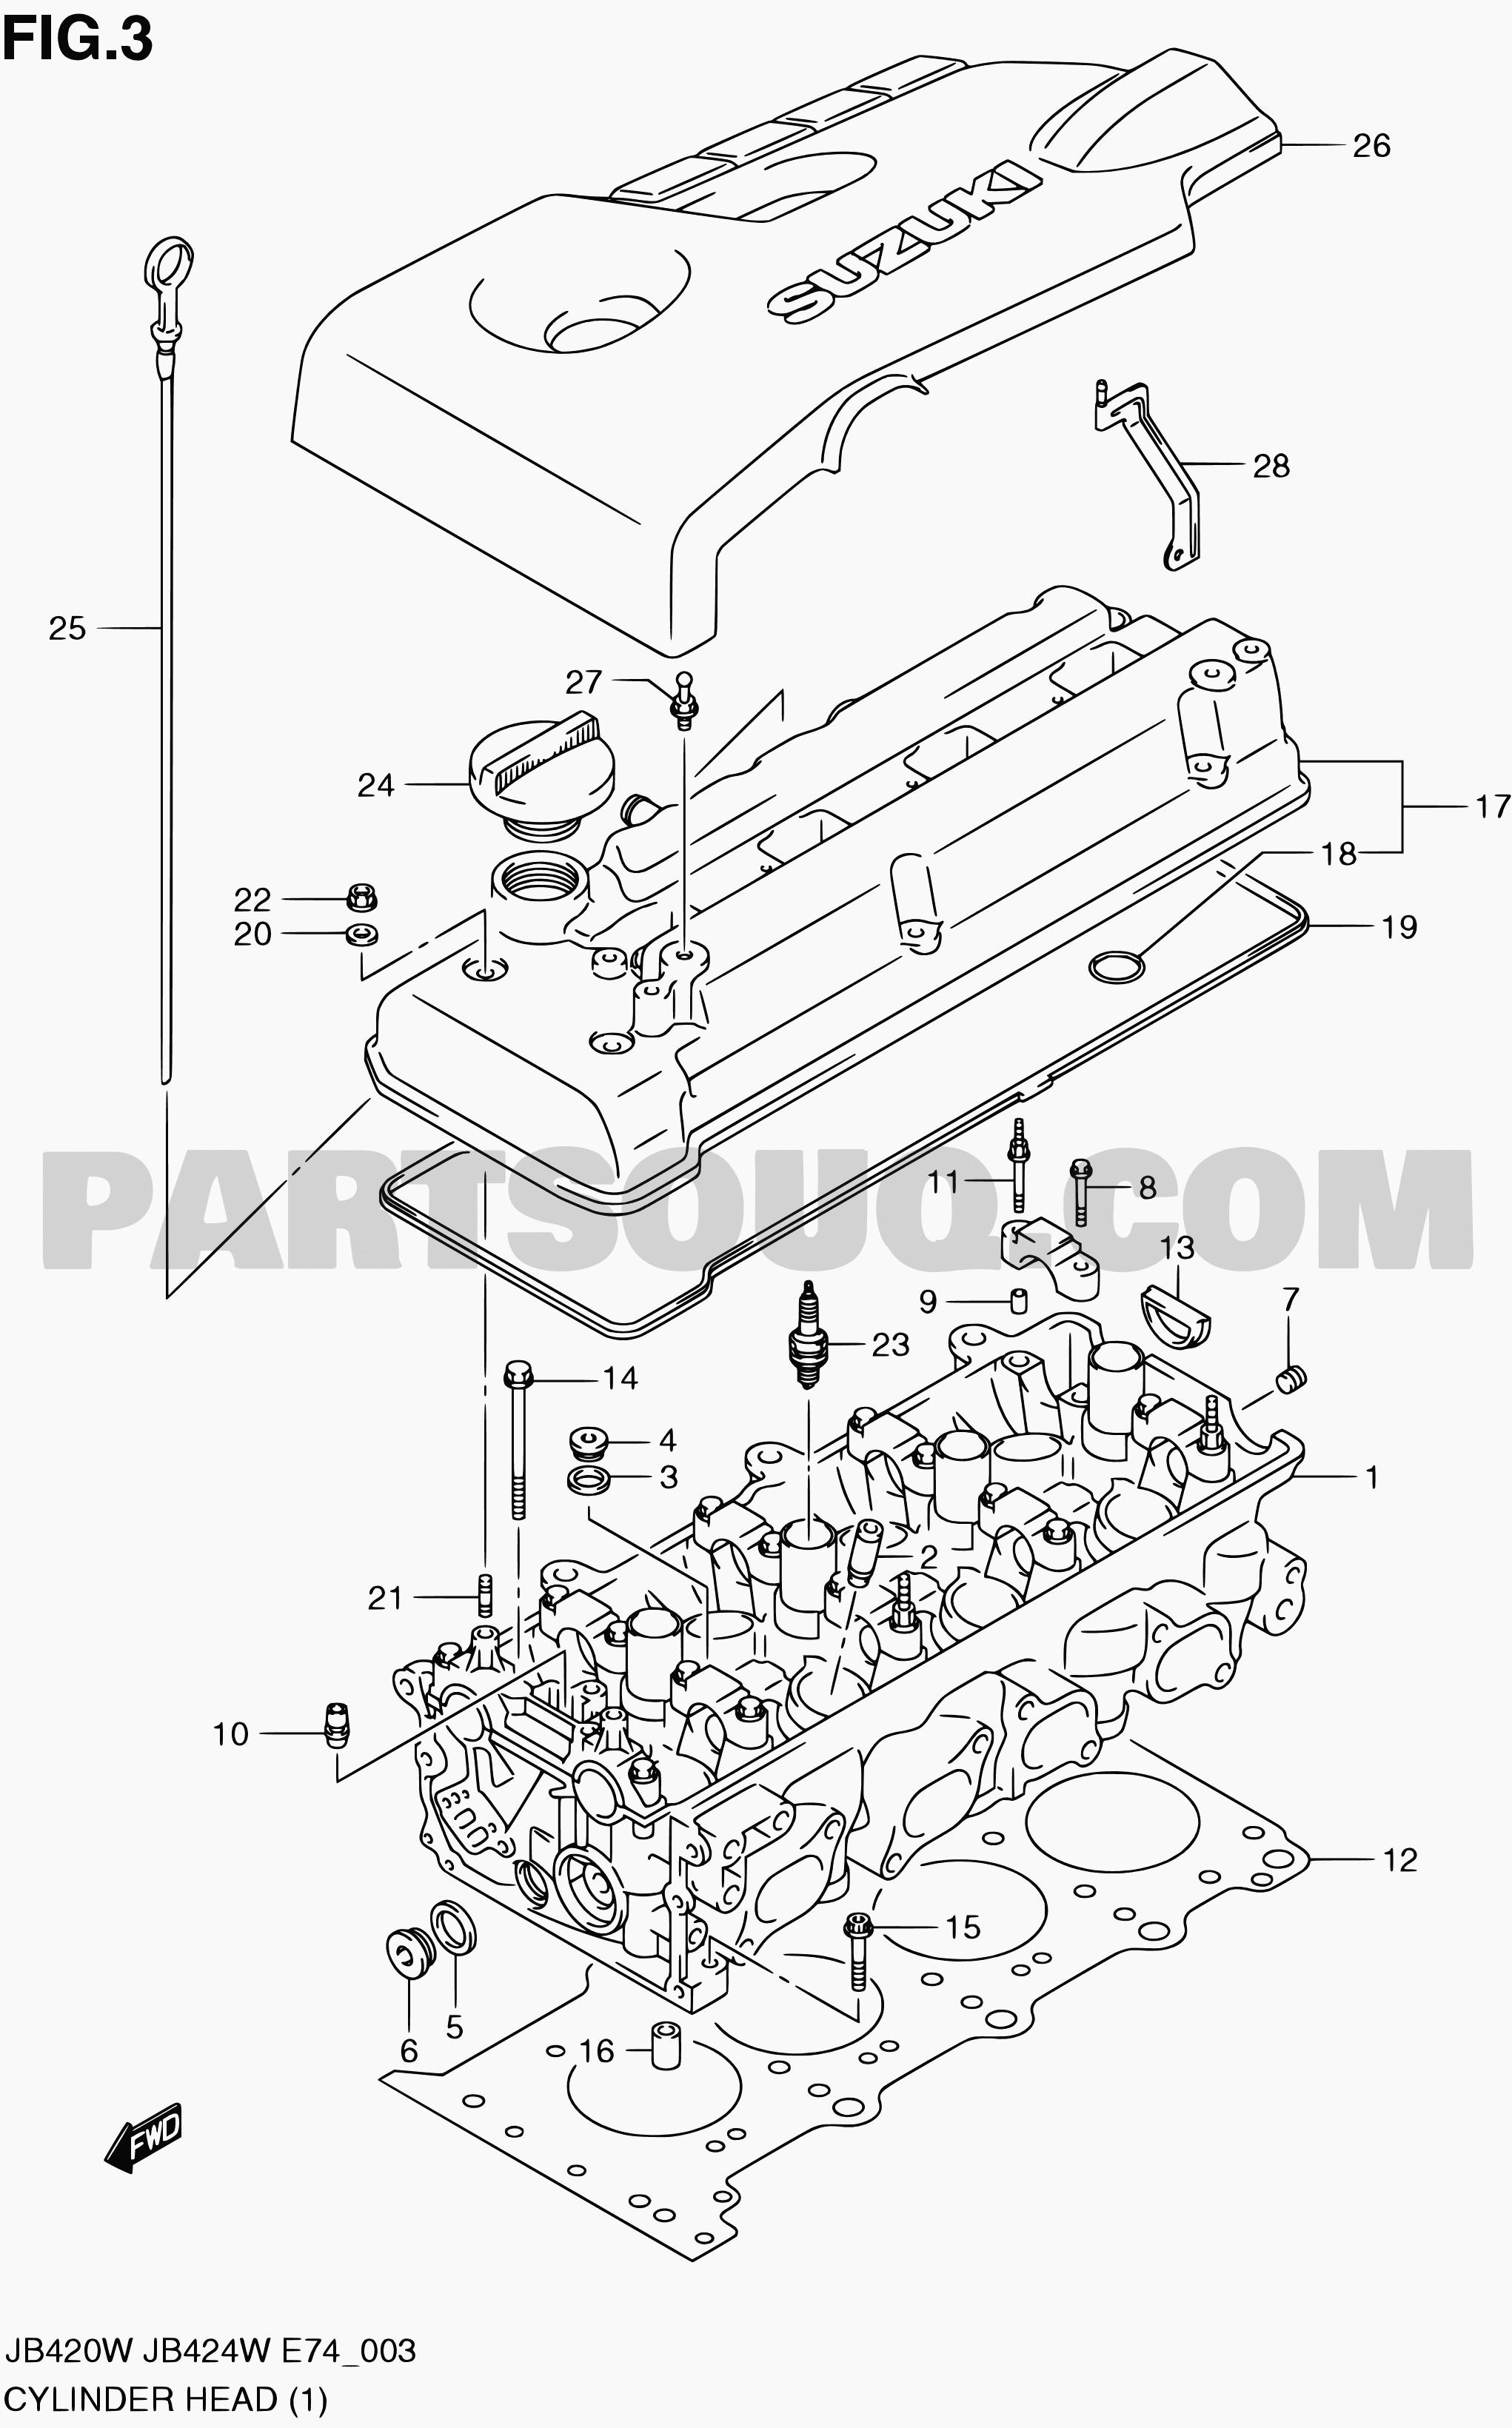 Suzuki Grand Vitara Engine Diagram 1 Engine Grand Vitara Jb420 Jb420w Suzuki Of Suzuki Grand Vitara Engine Diagram